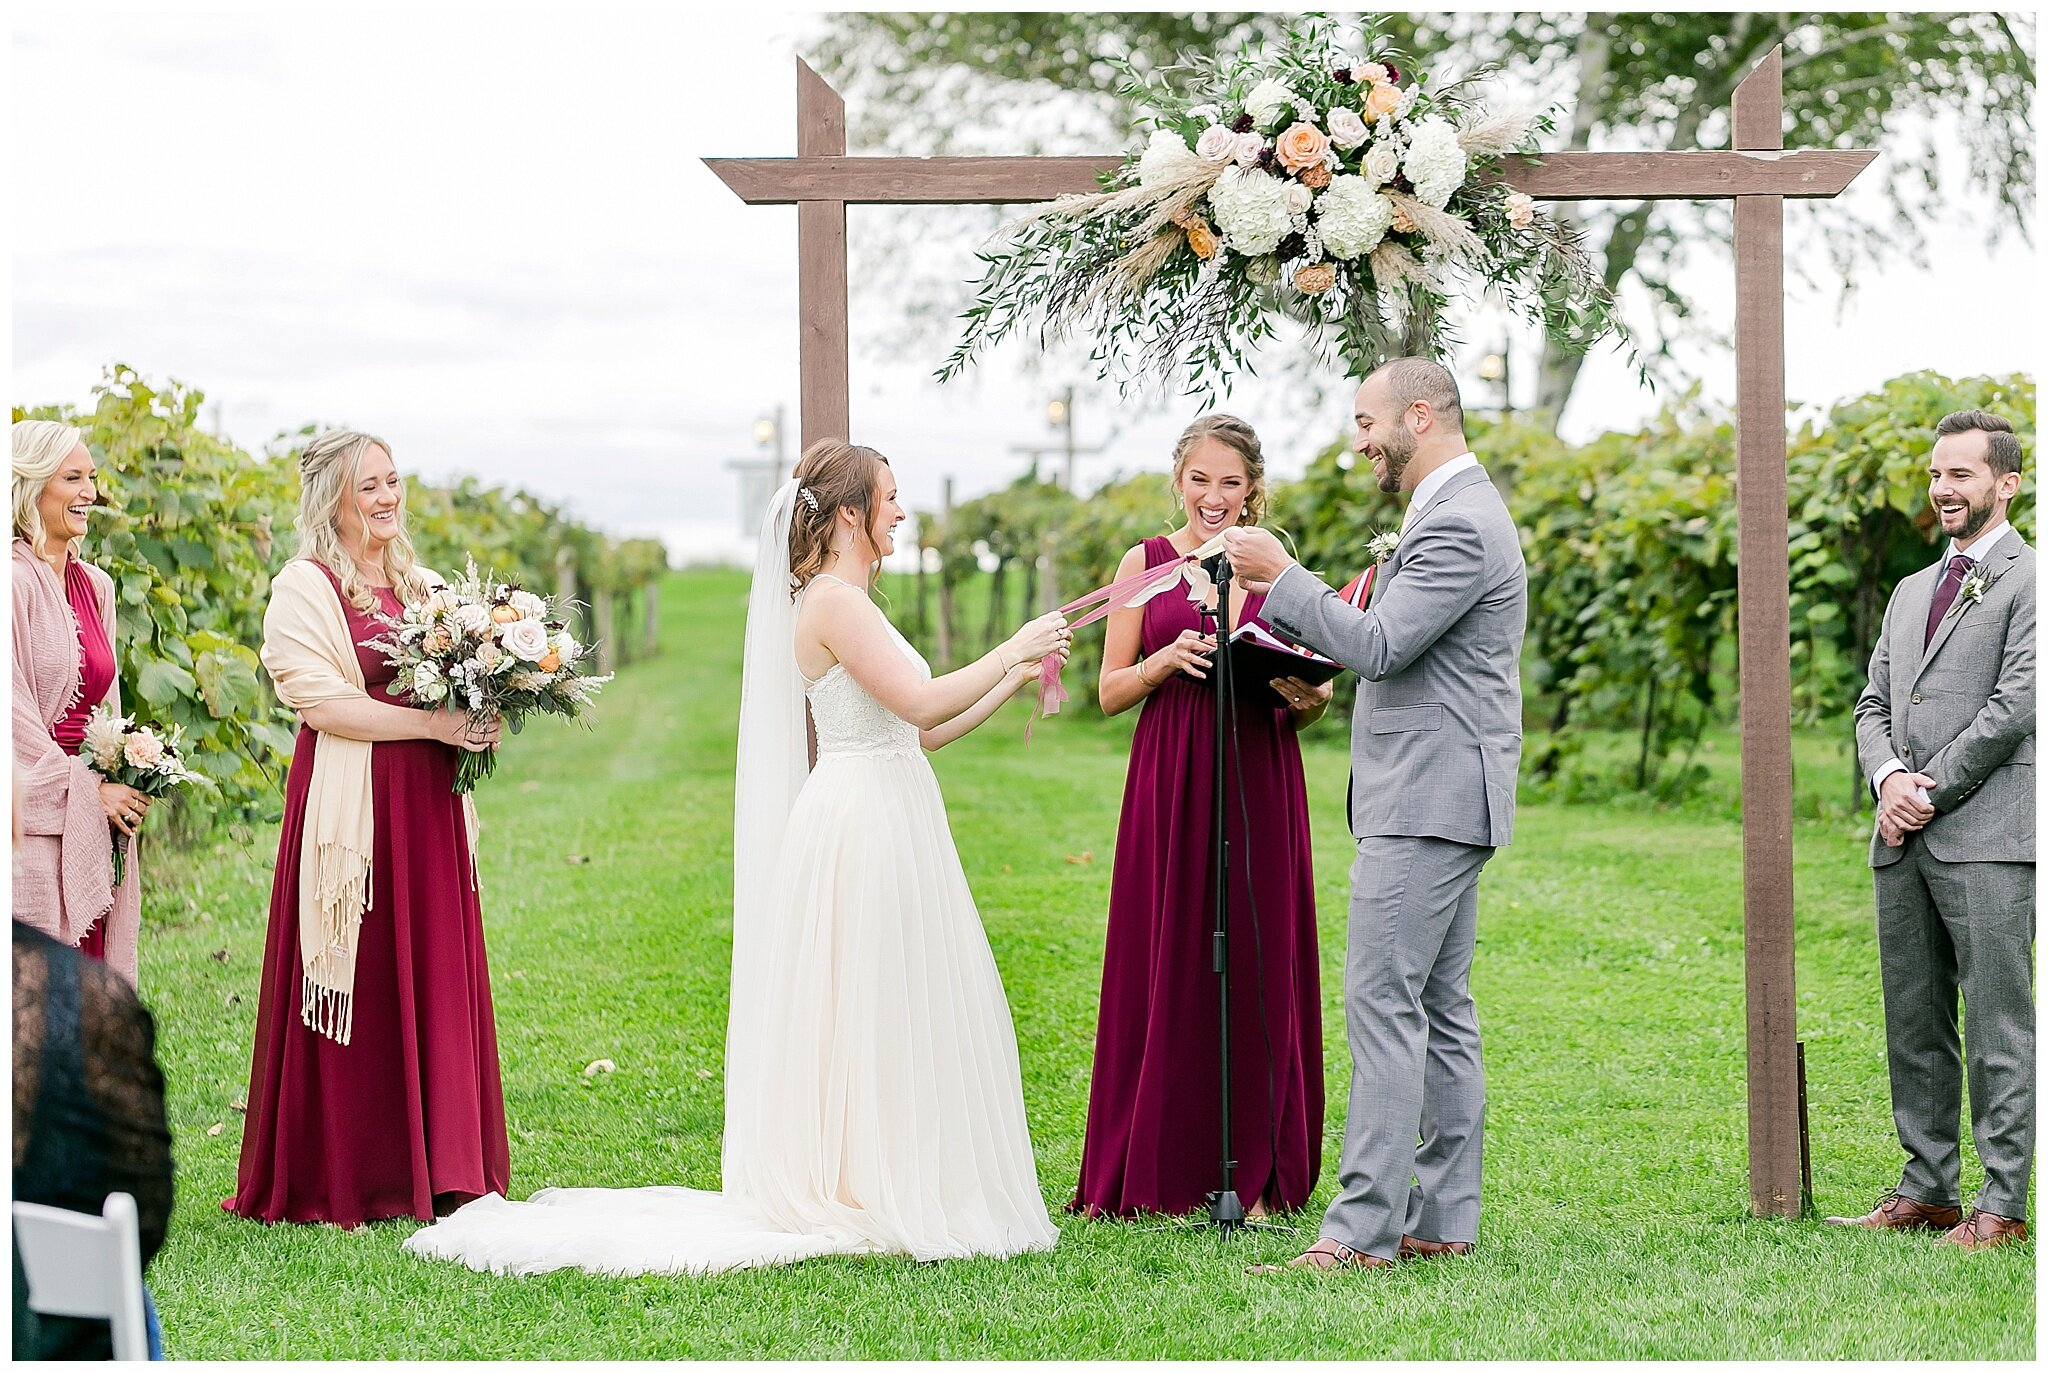 over_the_vines_edgerton_wisconsin_wedding_madison_wisconsin_photographer_0452.jpg